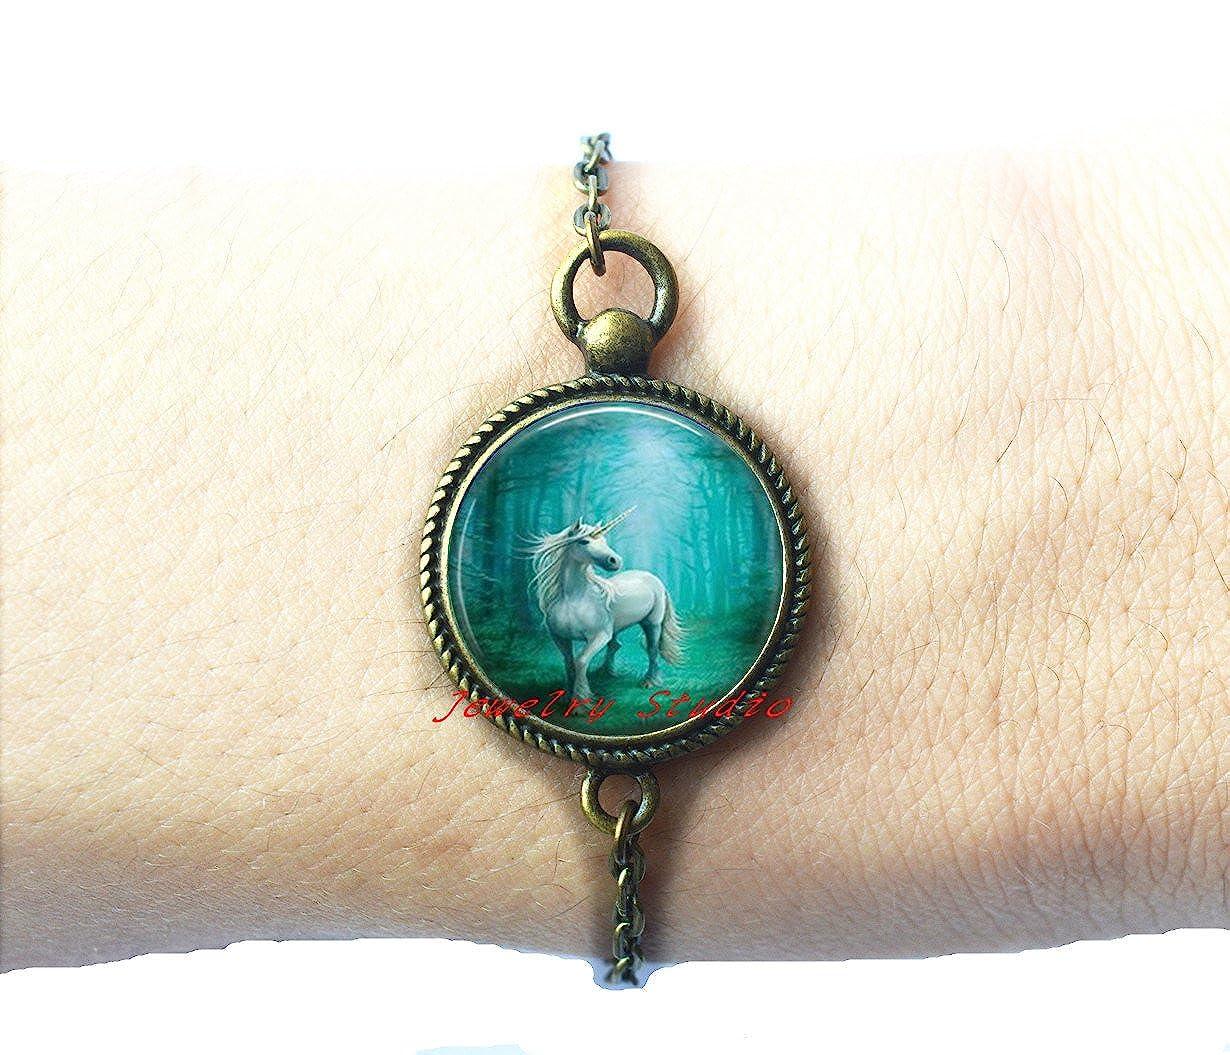 Amazon.com: Encantador moda pulsera, pulsera de unicornio ...